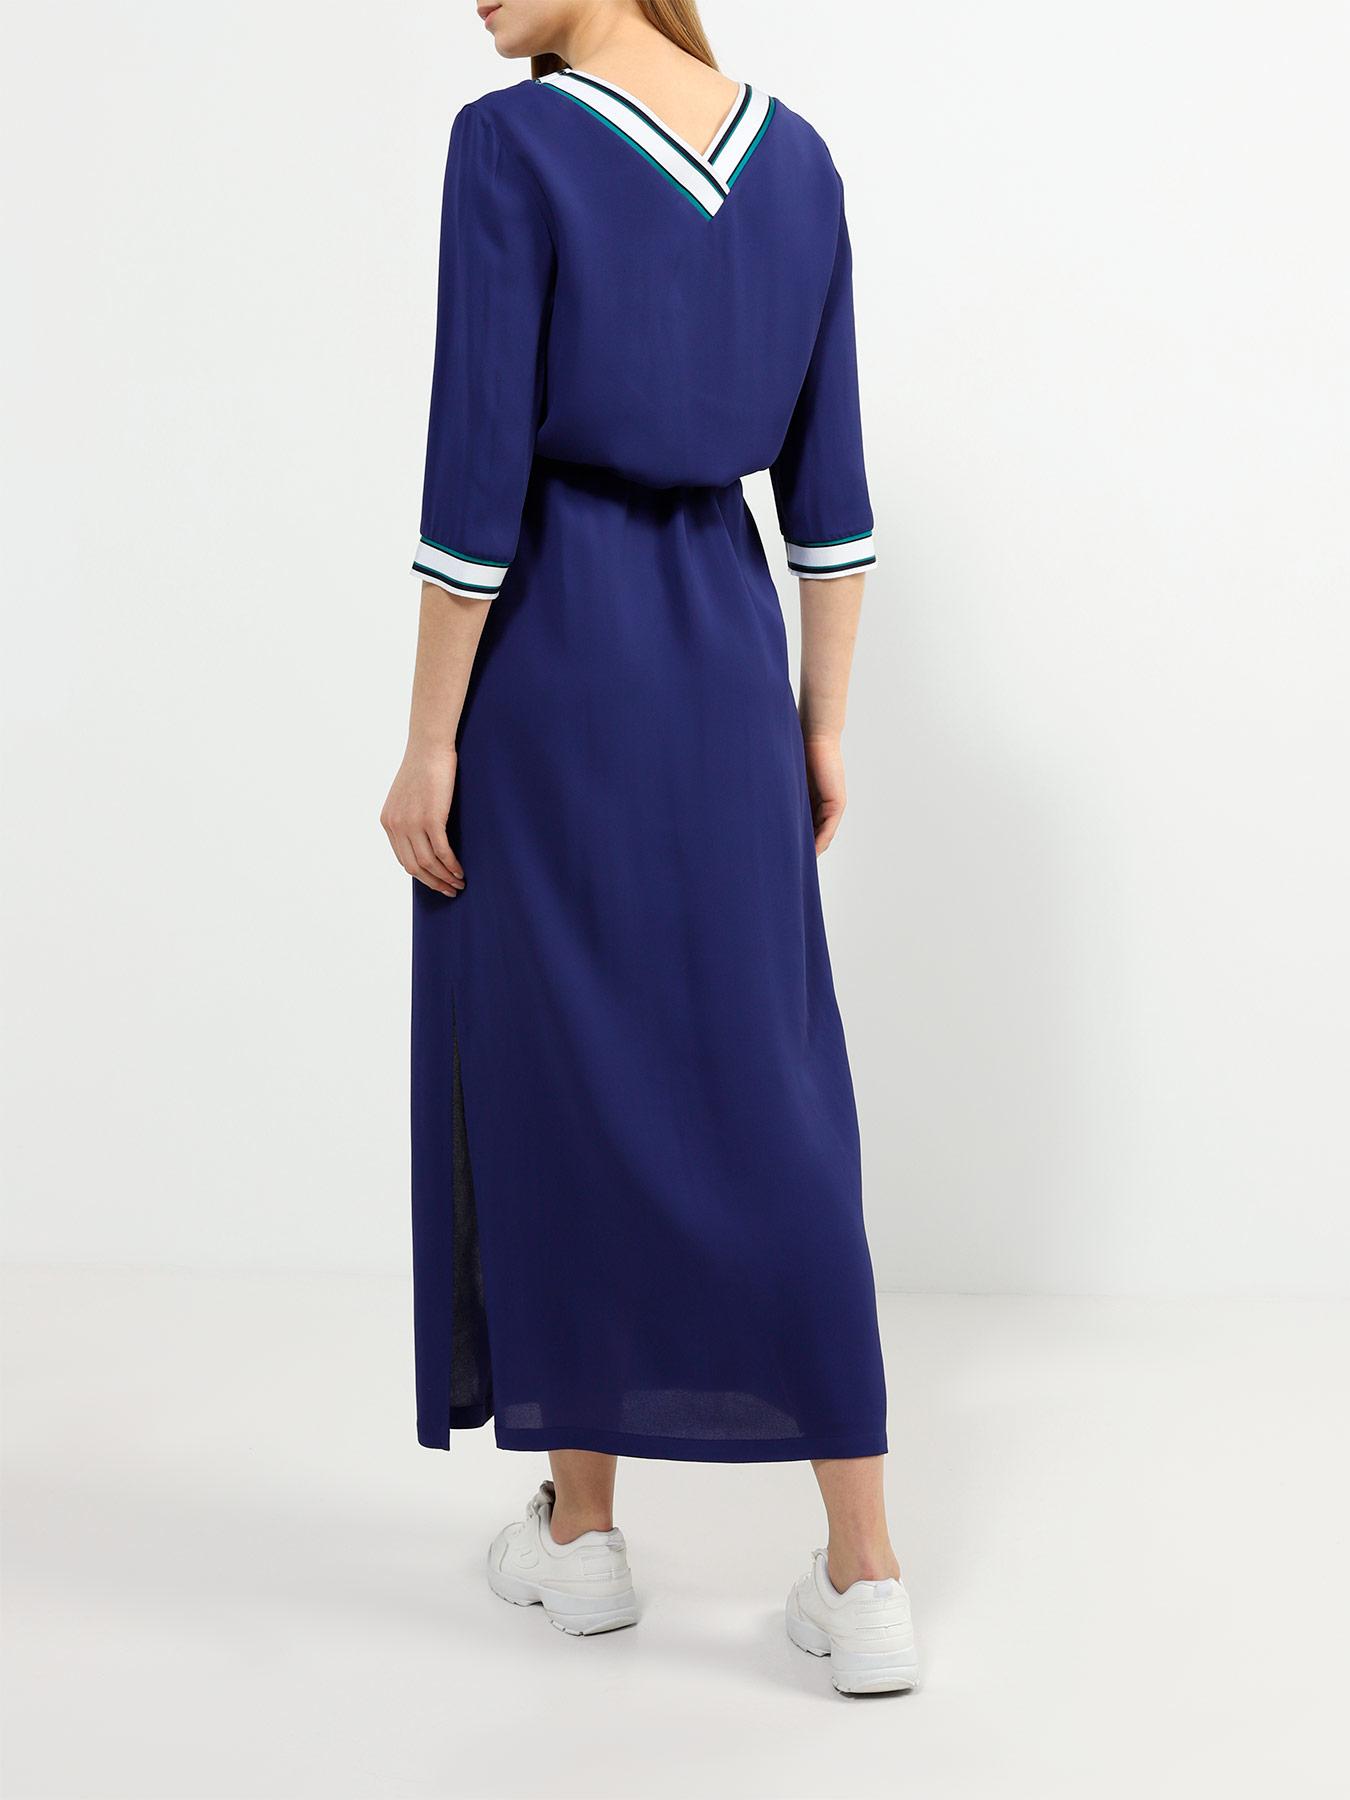 Платье Korpo Платье платье korpo платье